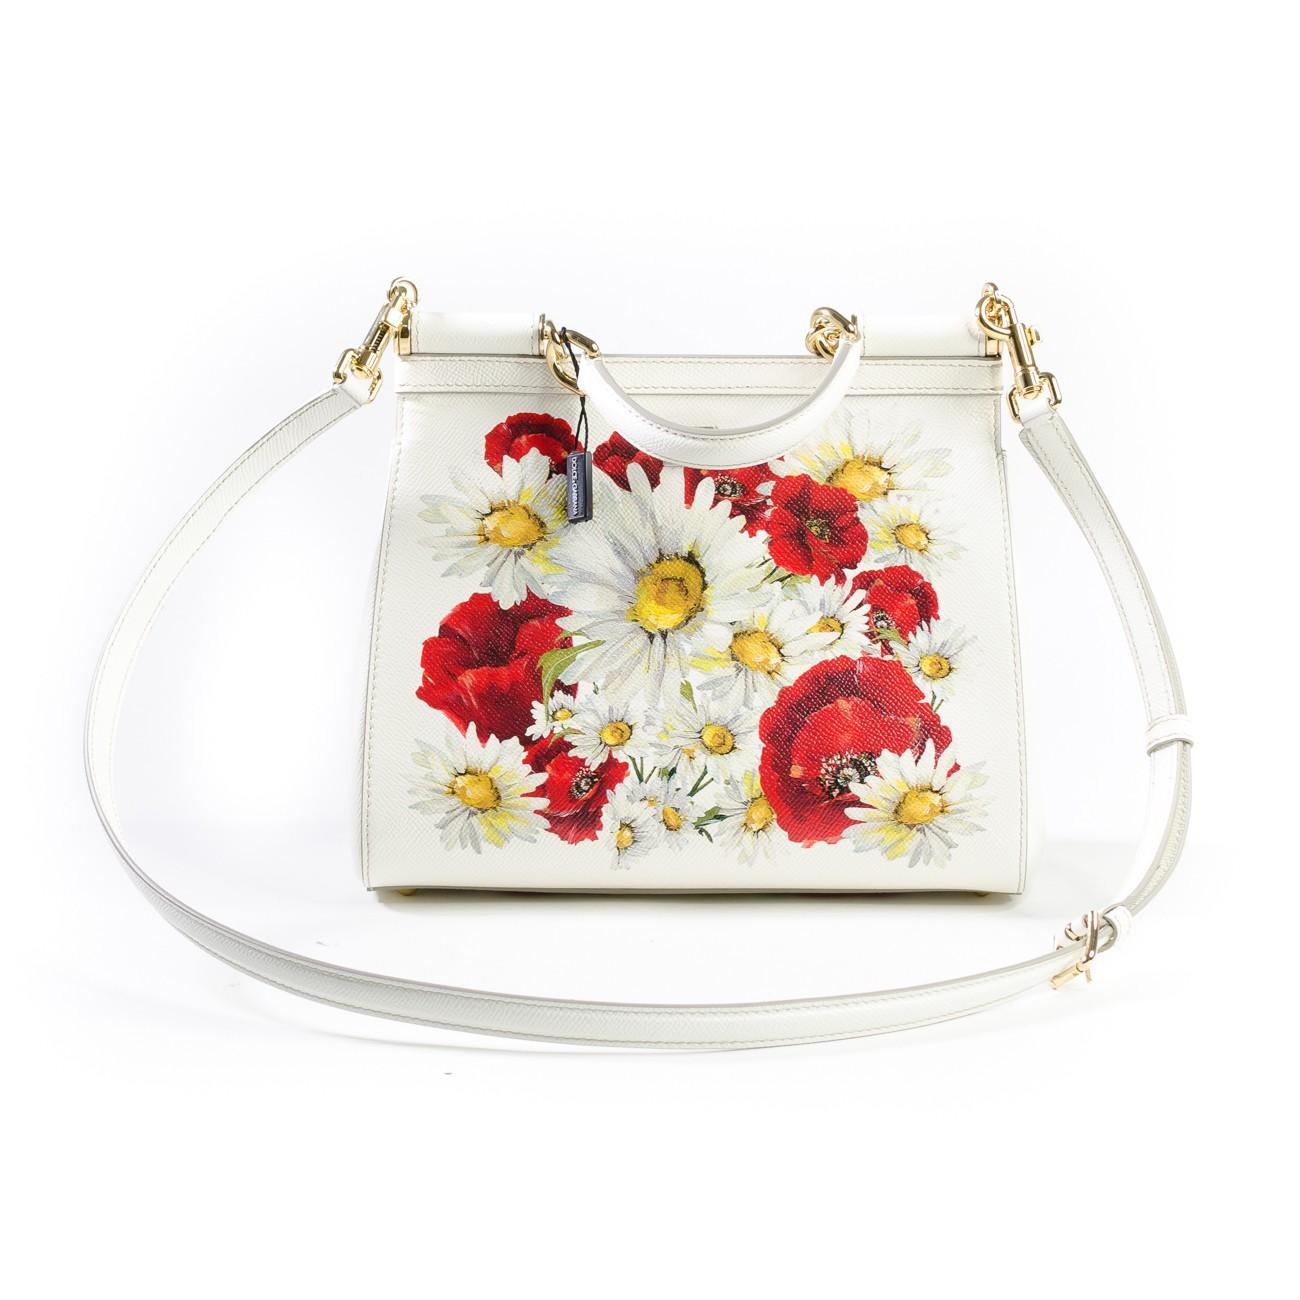 8b2936cfc7 Dolce and Gabbana Sicily handbag in Printed Dauphine Calfskin